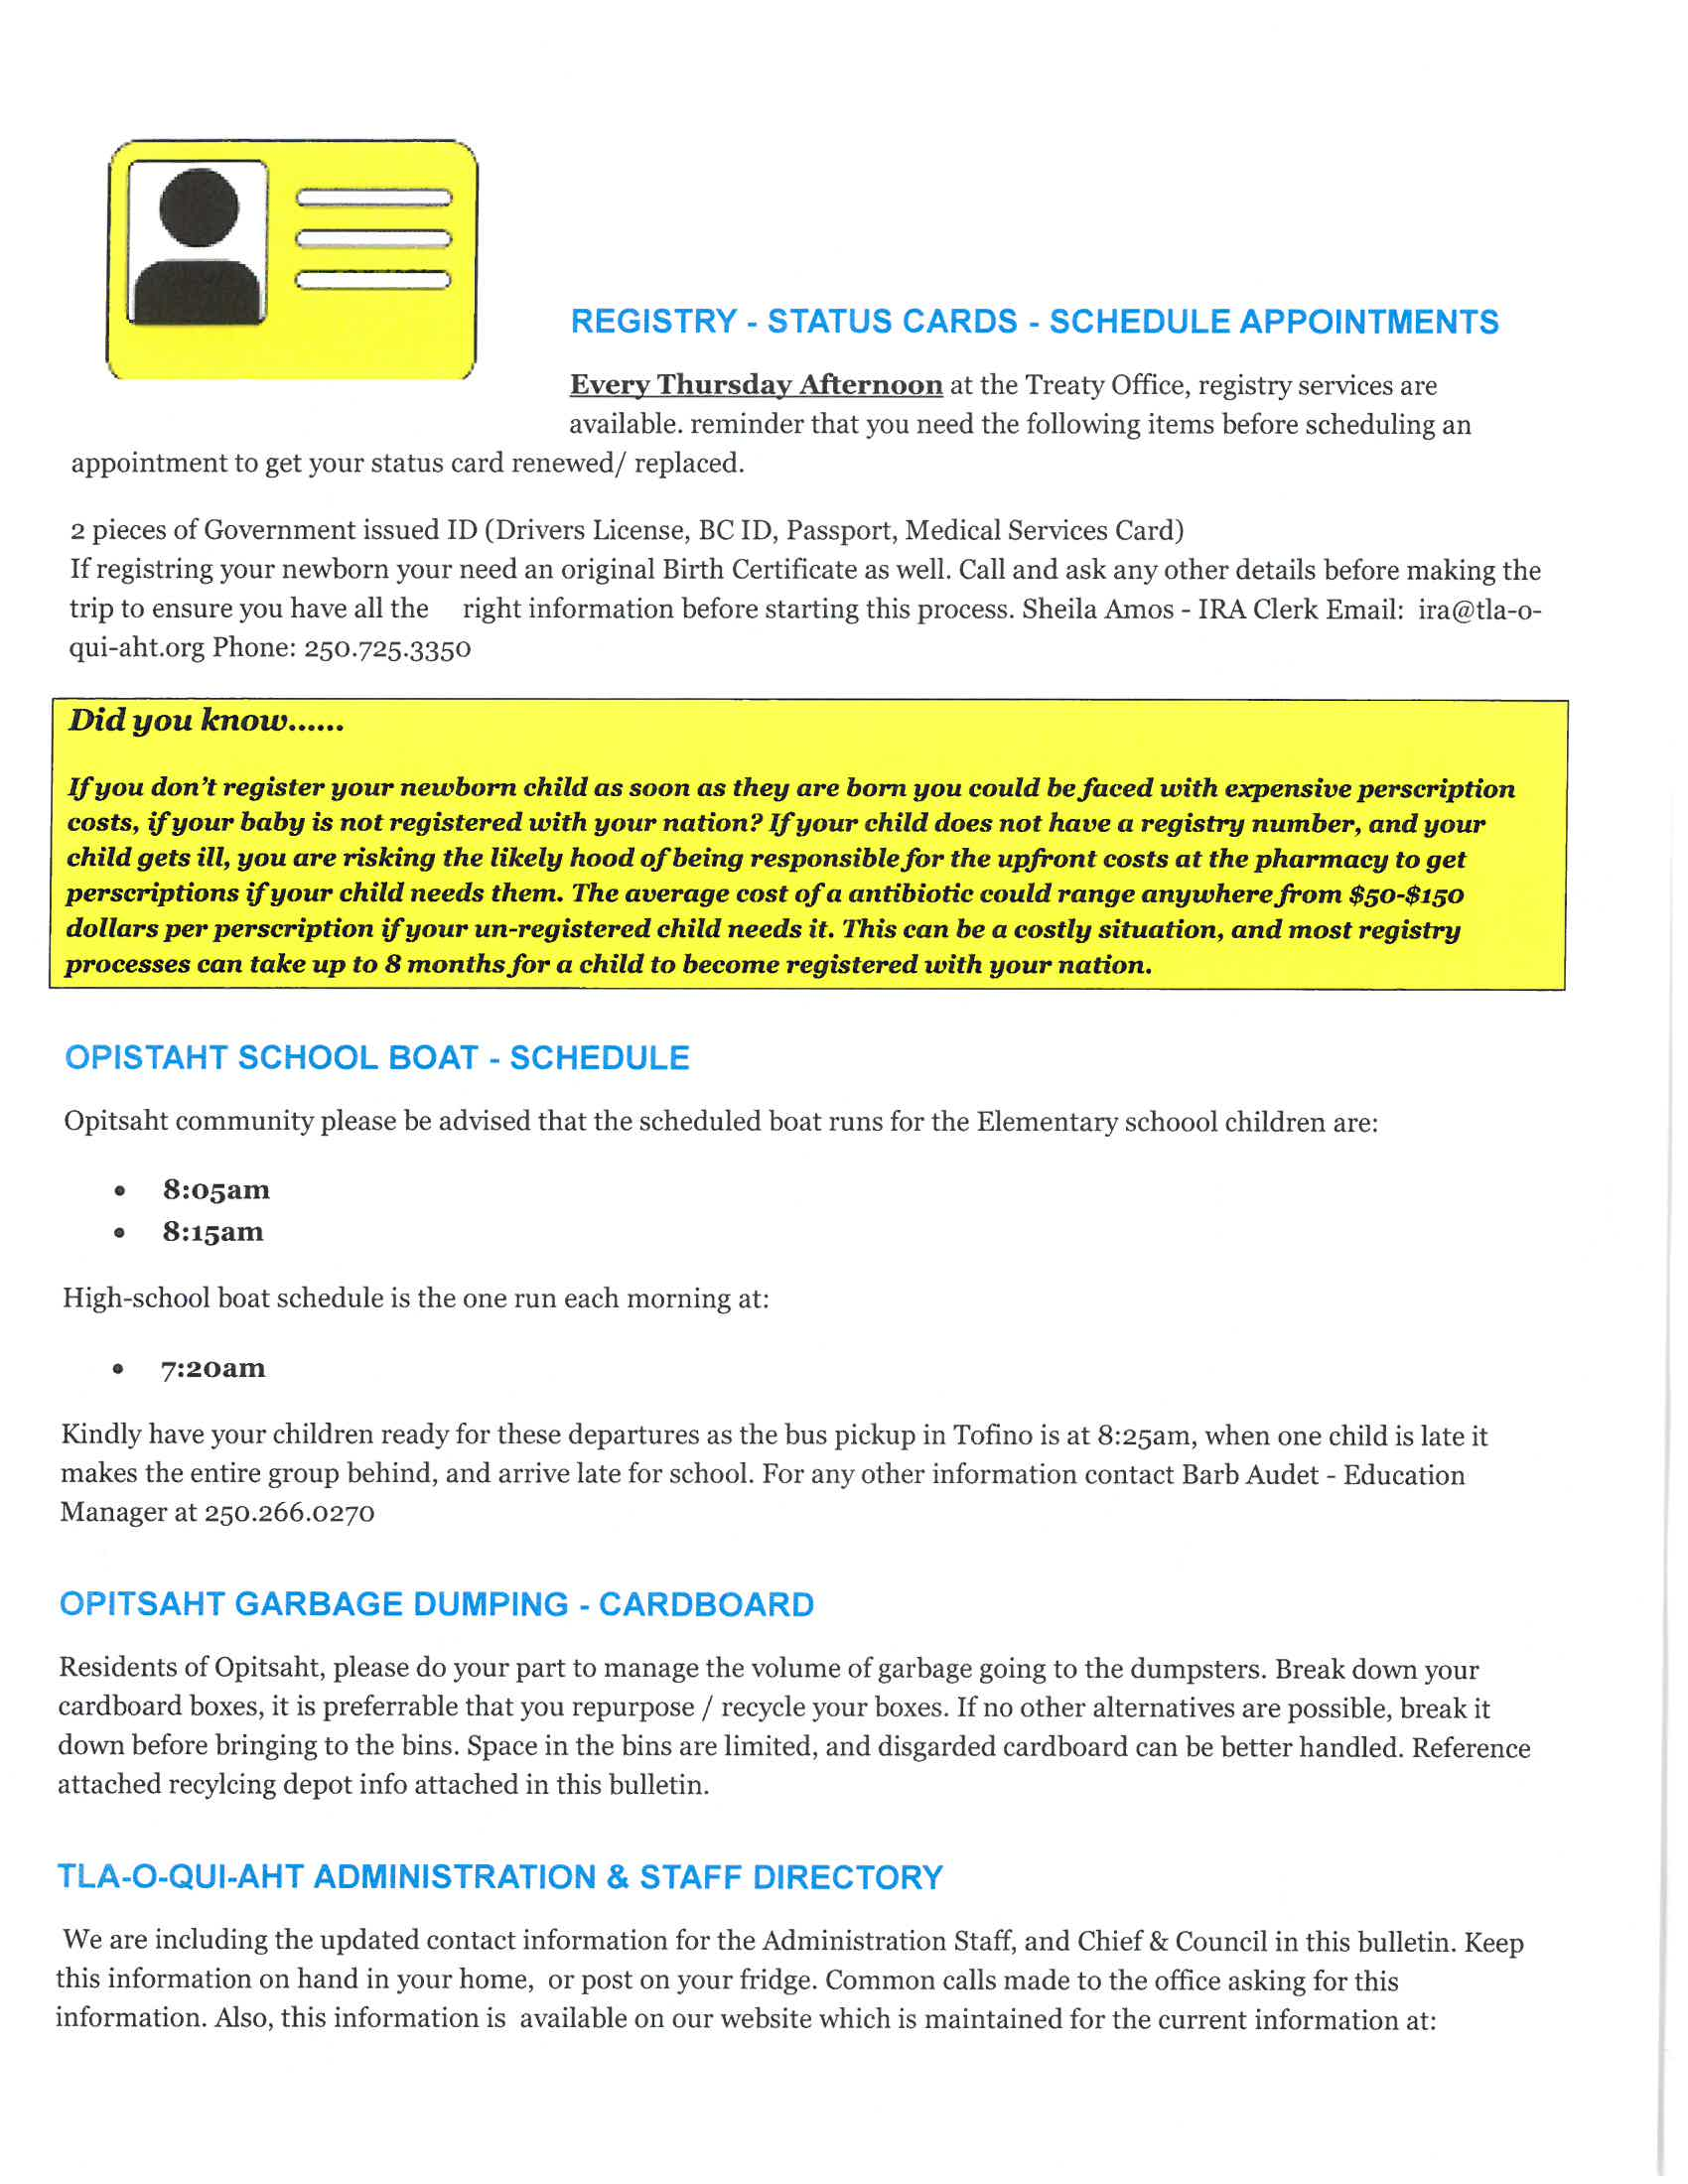 TFN Bulletin Apr 6-2016_Page_02.jpg